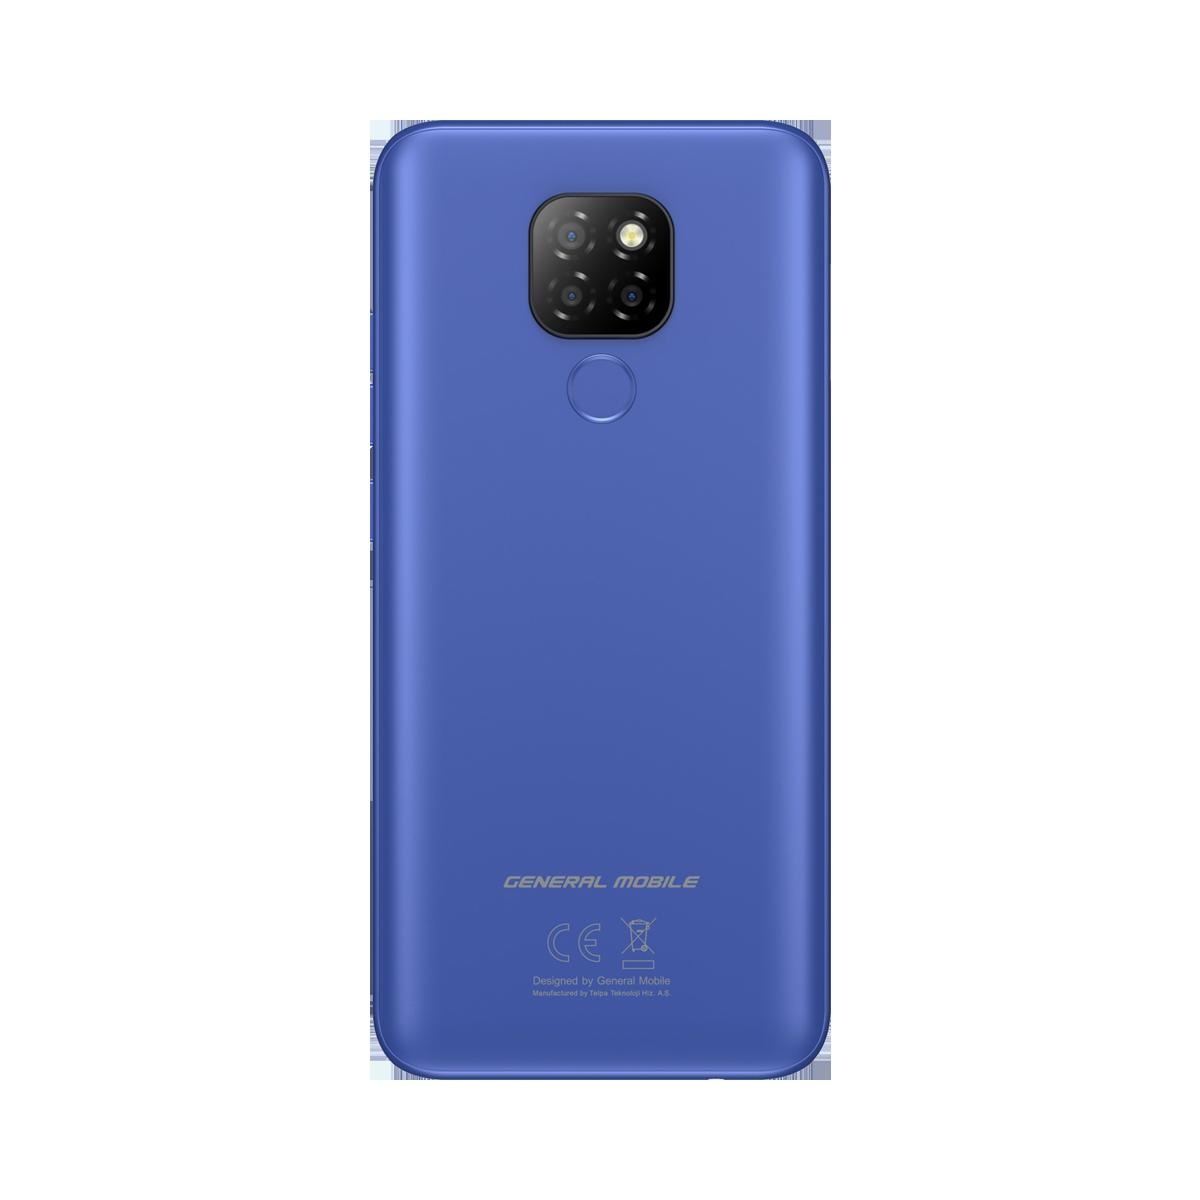 General Mobile GM 20 64 GB Mavi